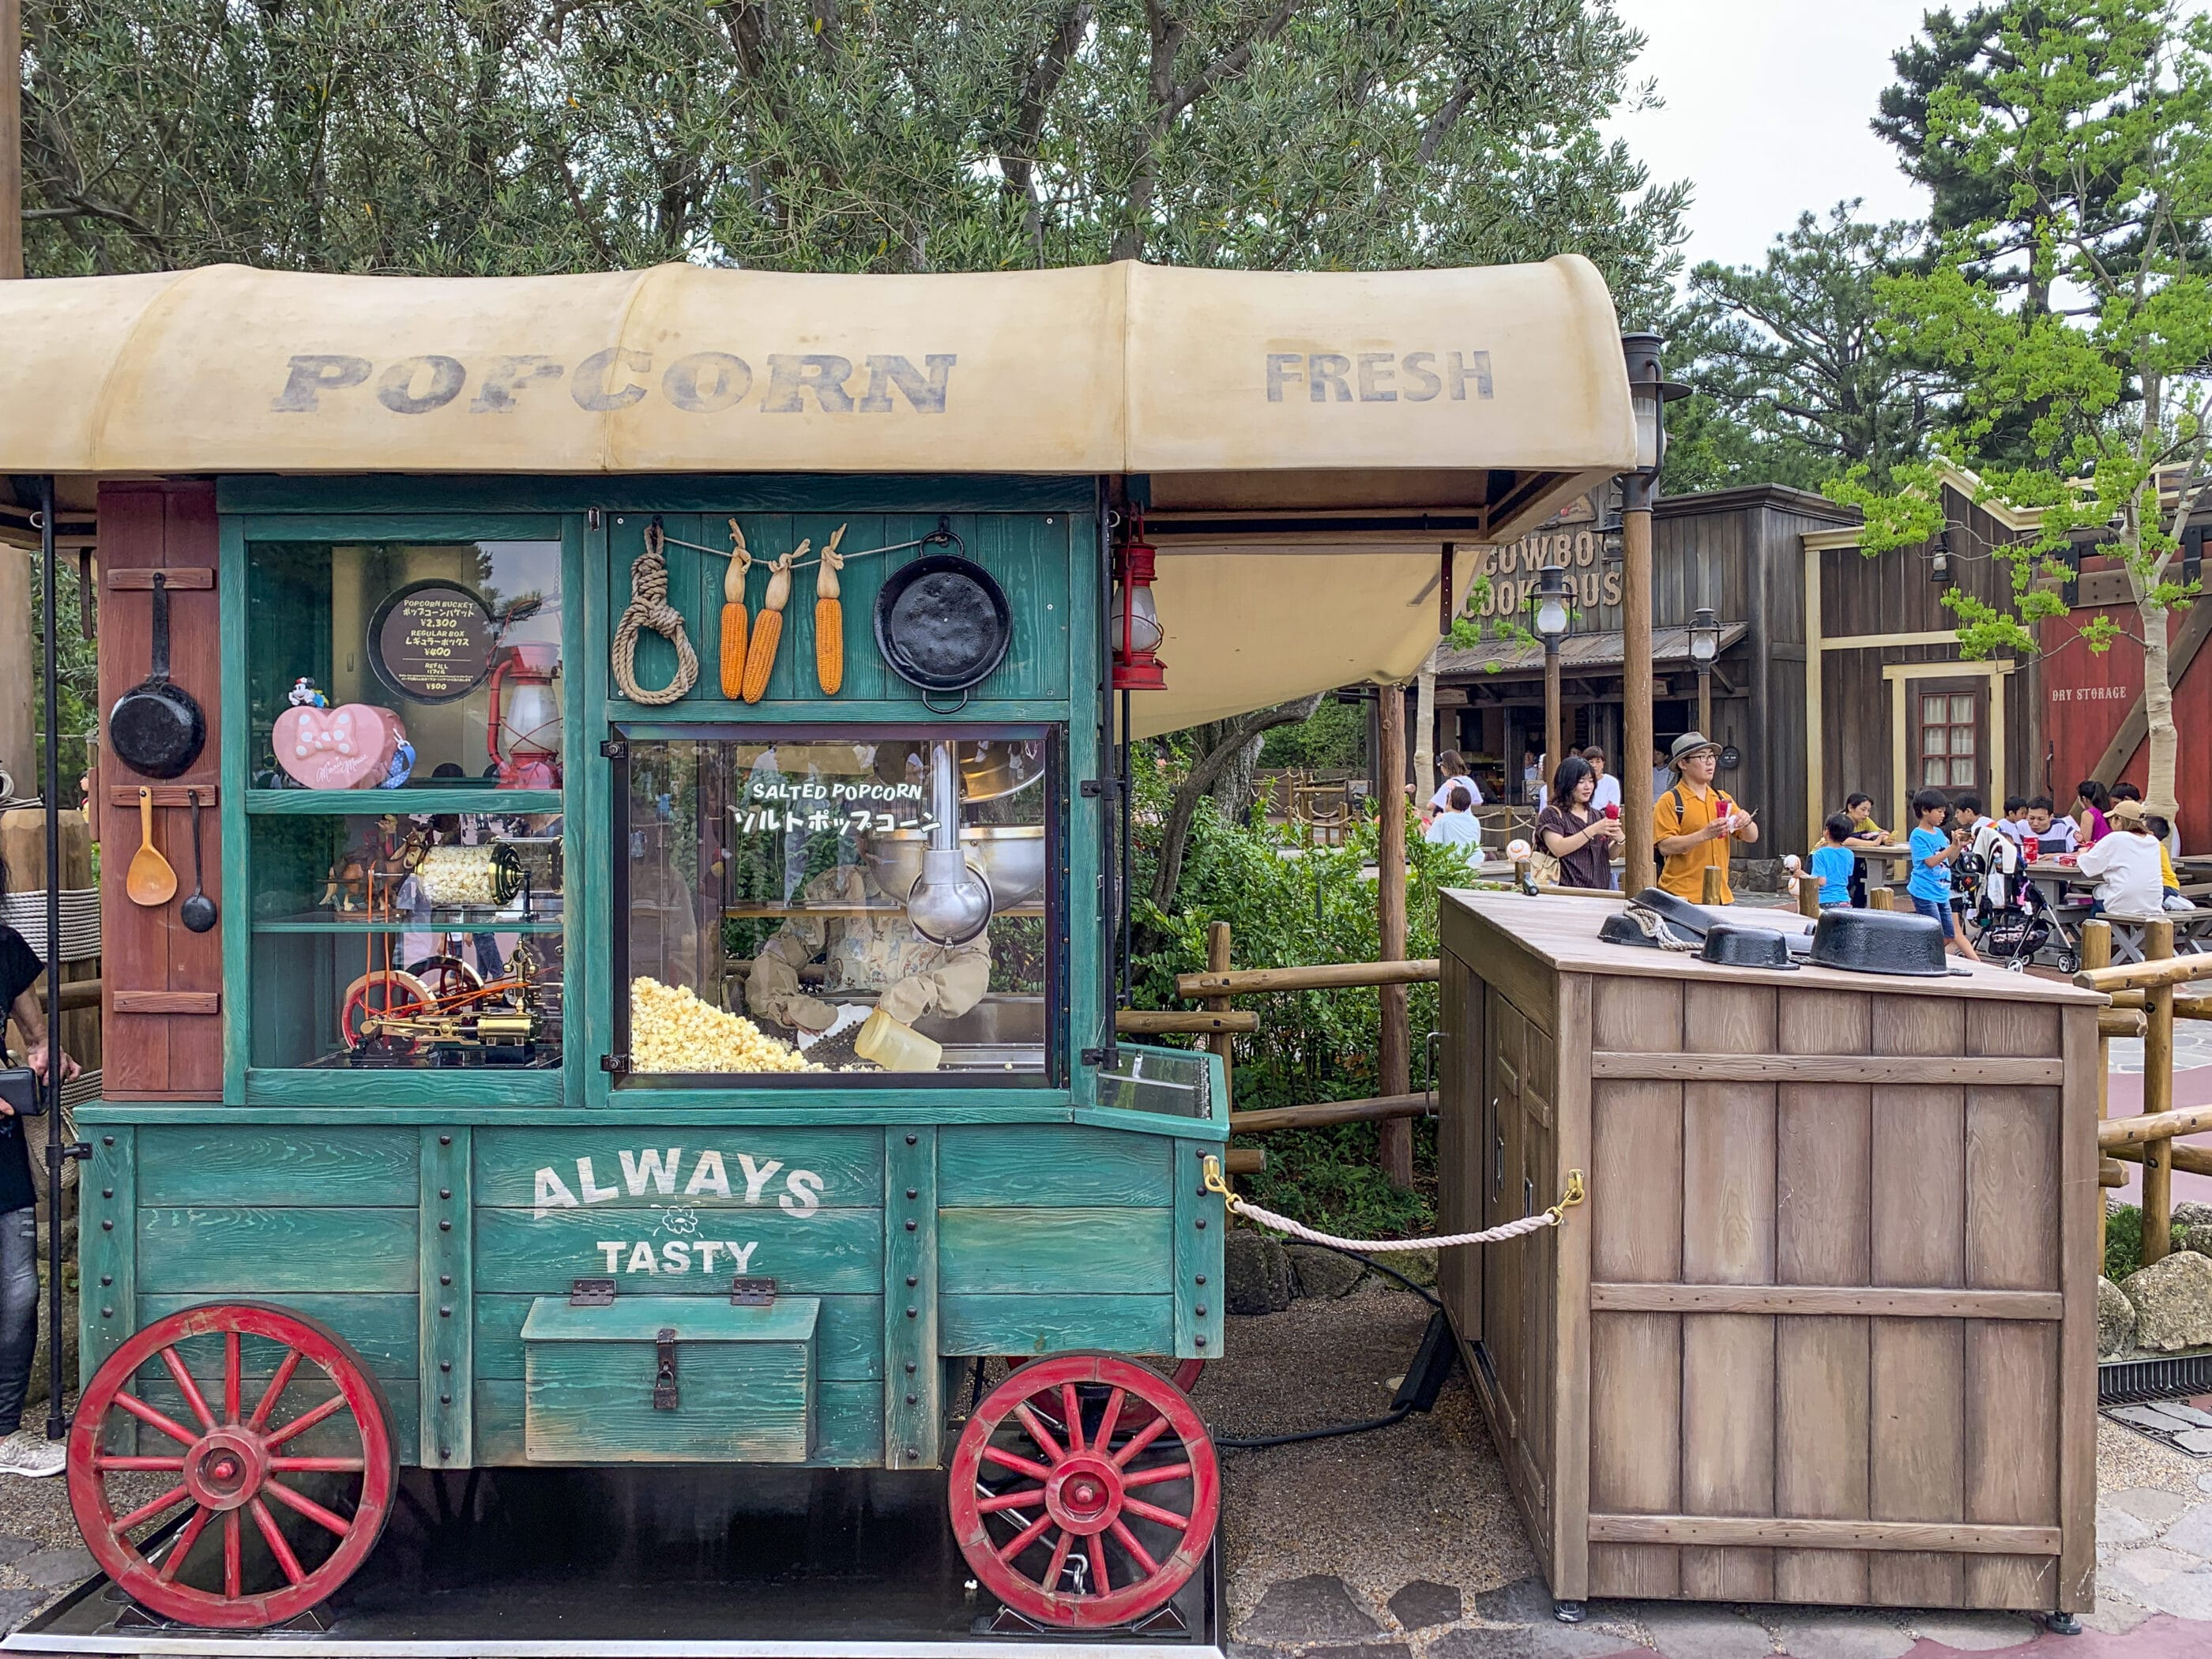 One of the many popcorn carts at Tokyo Disneyland